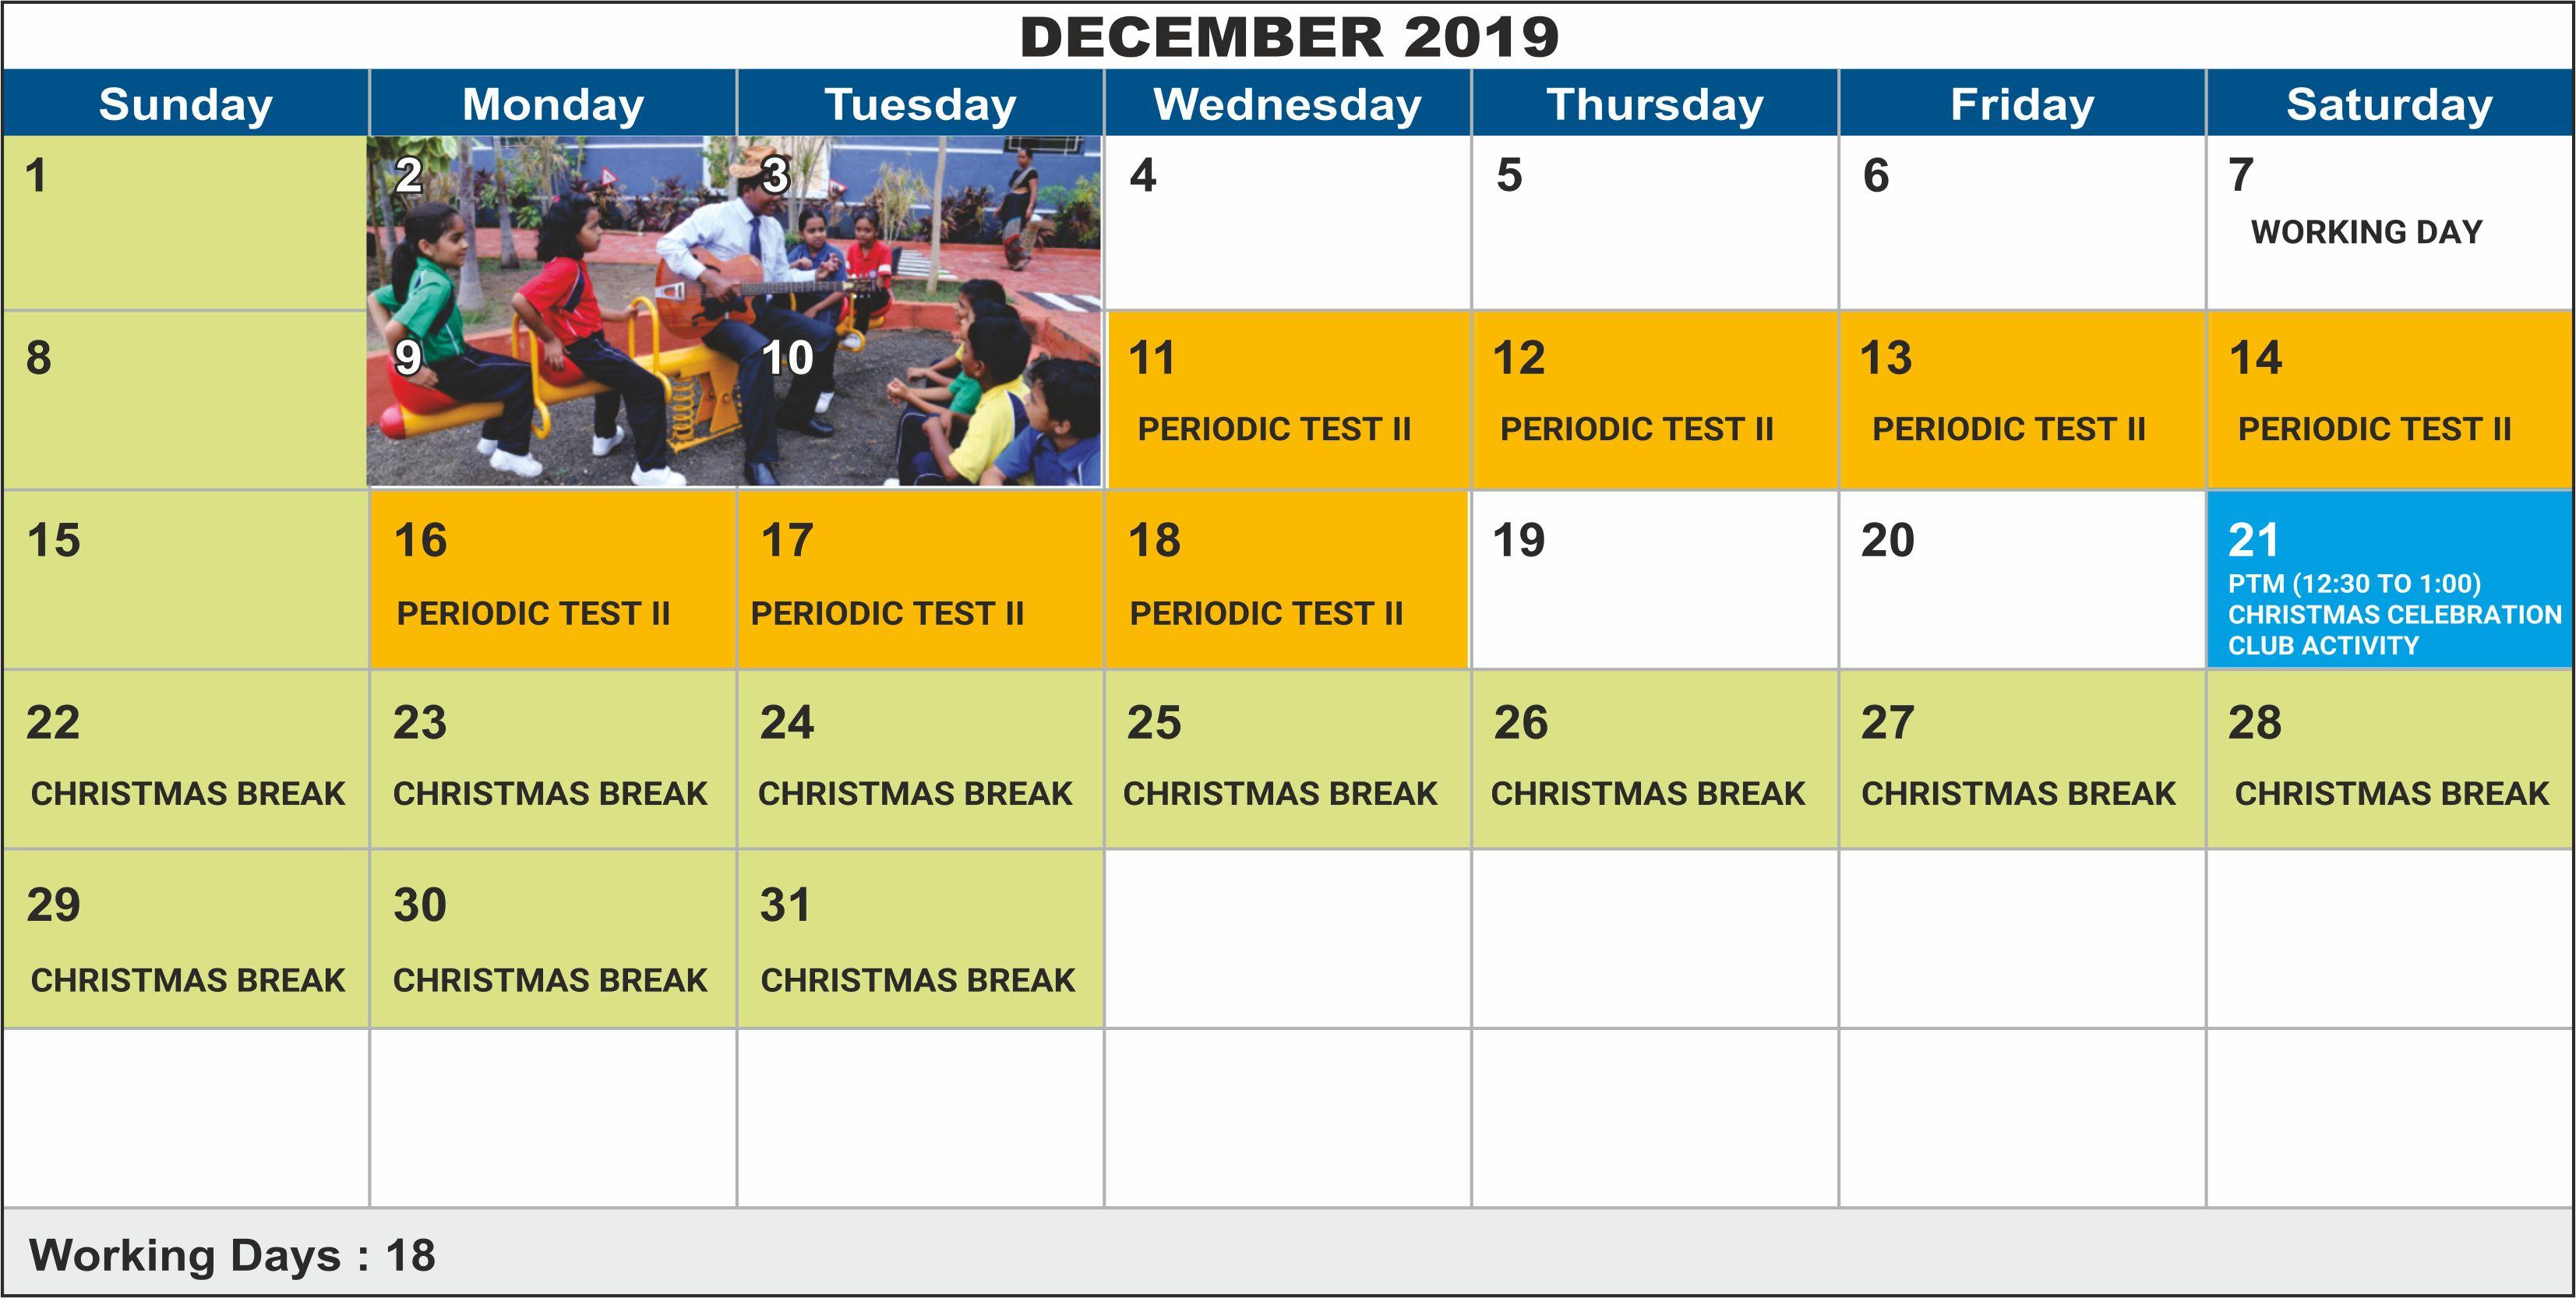 december-19